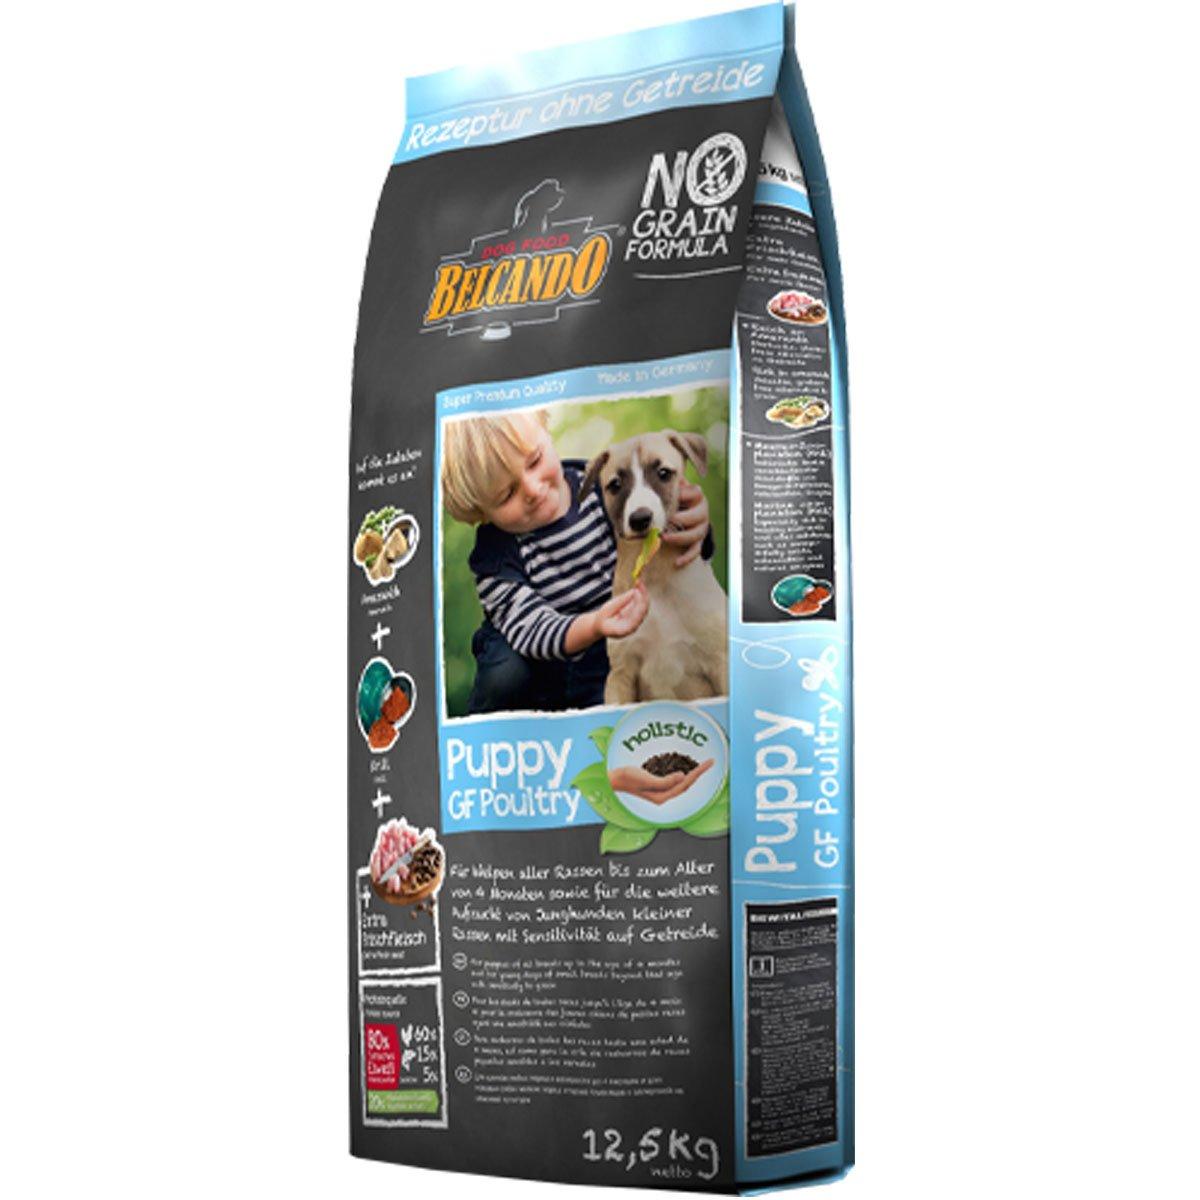 BELCANDO - Grain Free Puppy Food Poultry: Amazon co uk: Pet